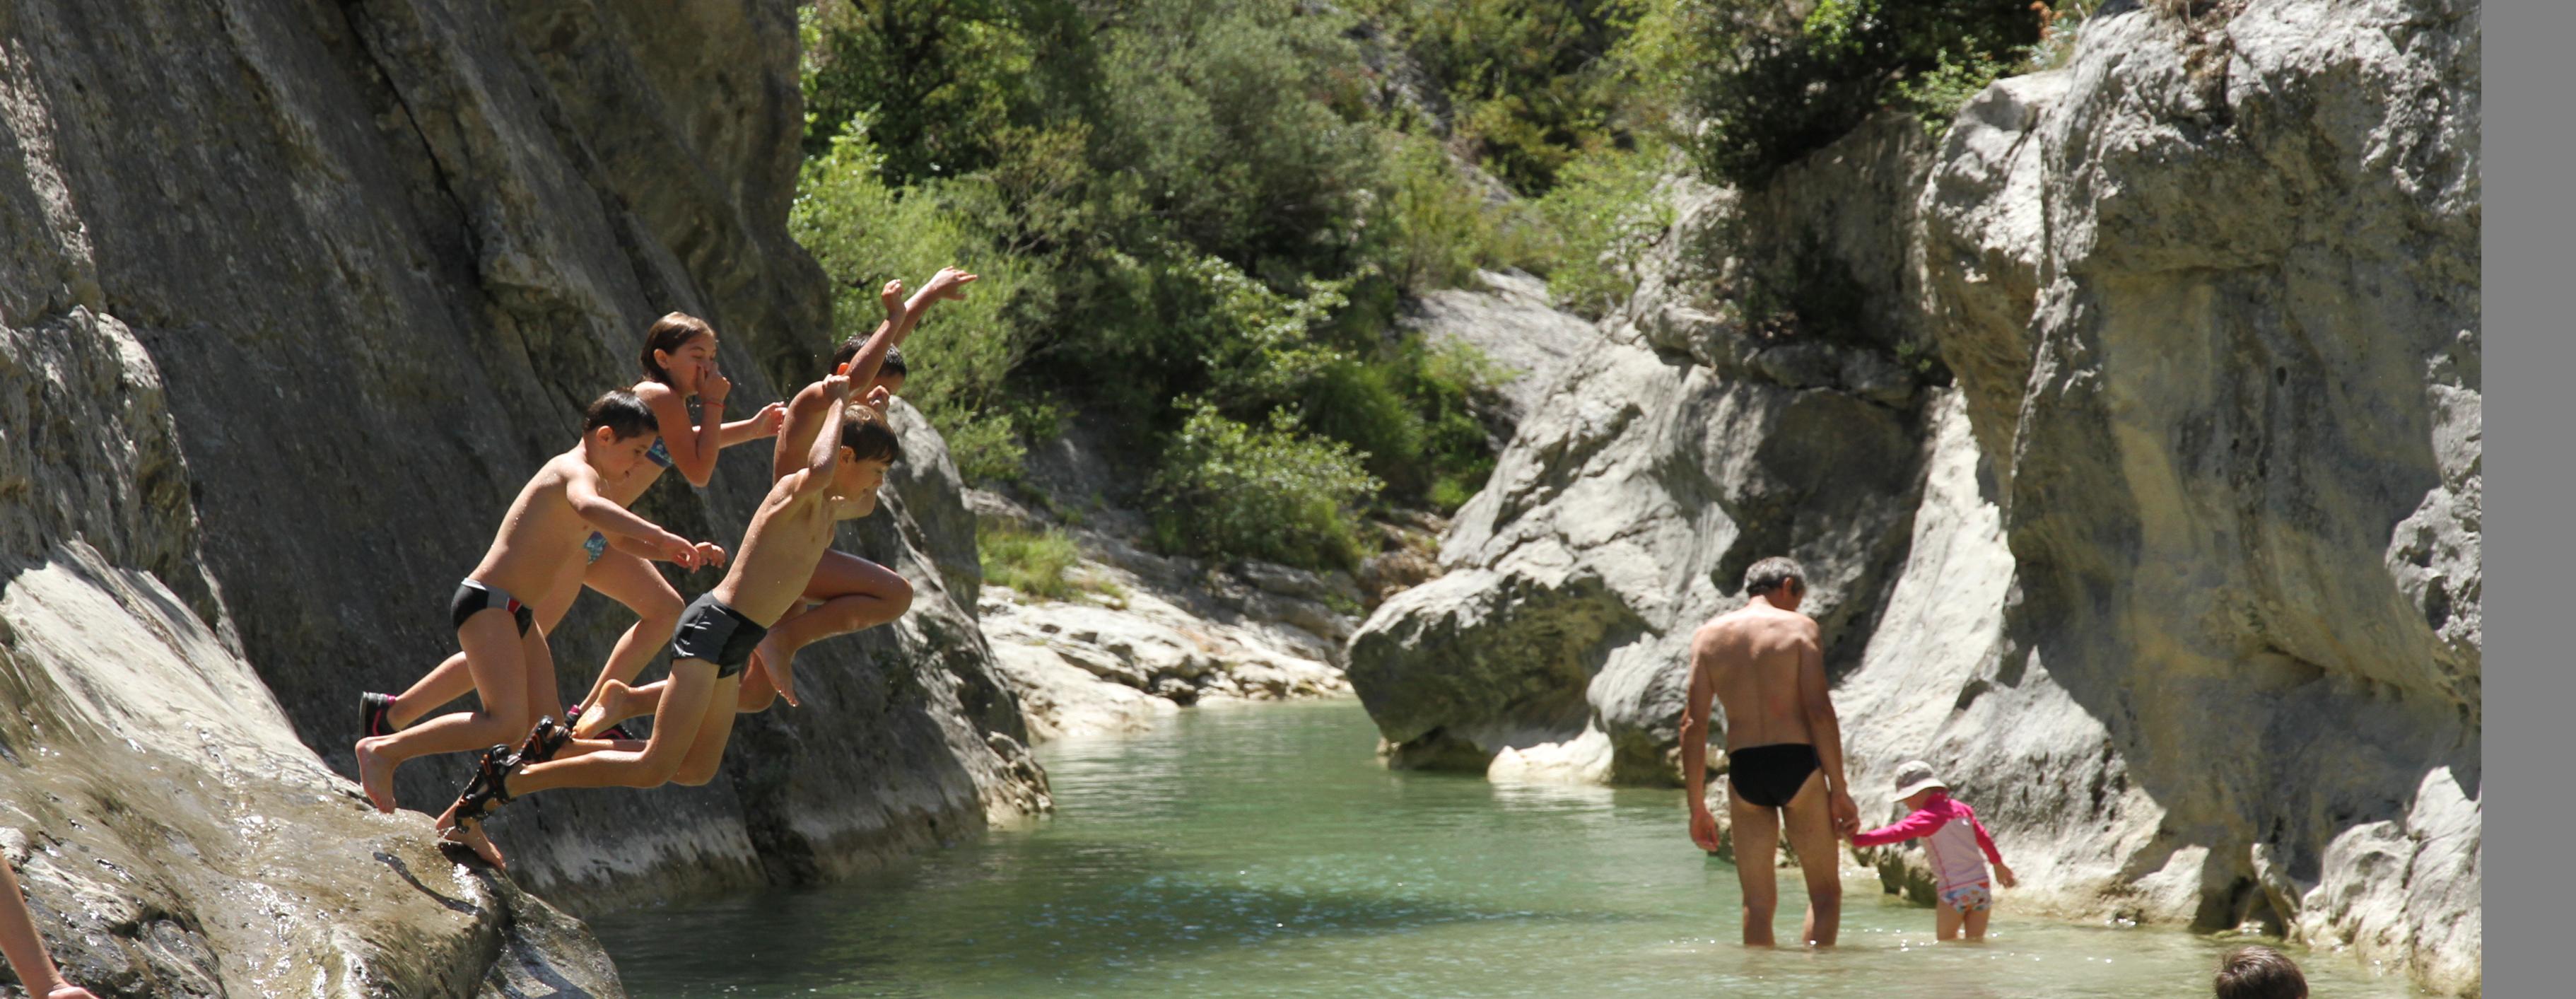 saut riviere